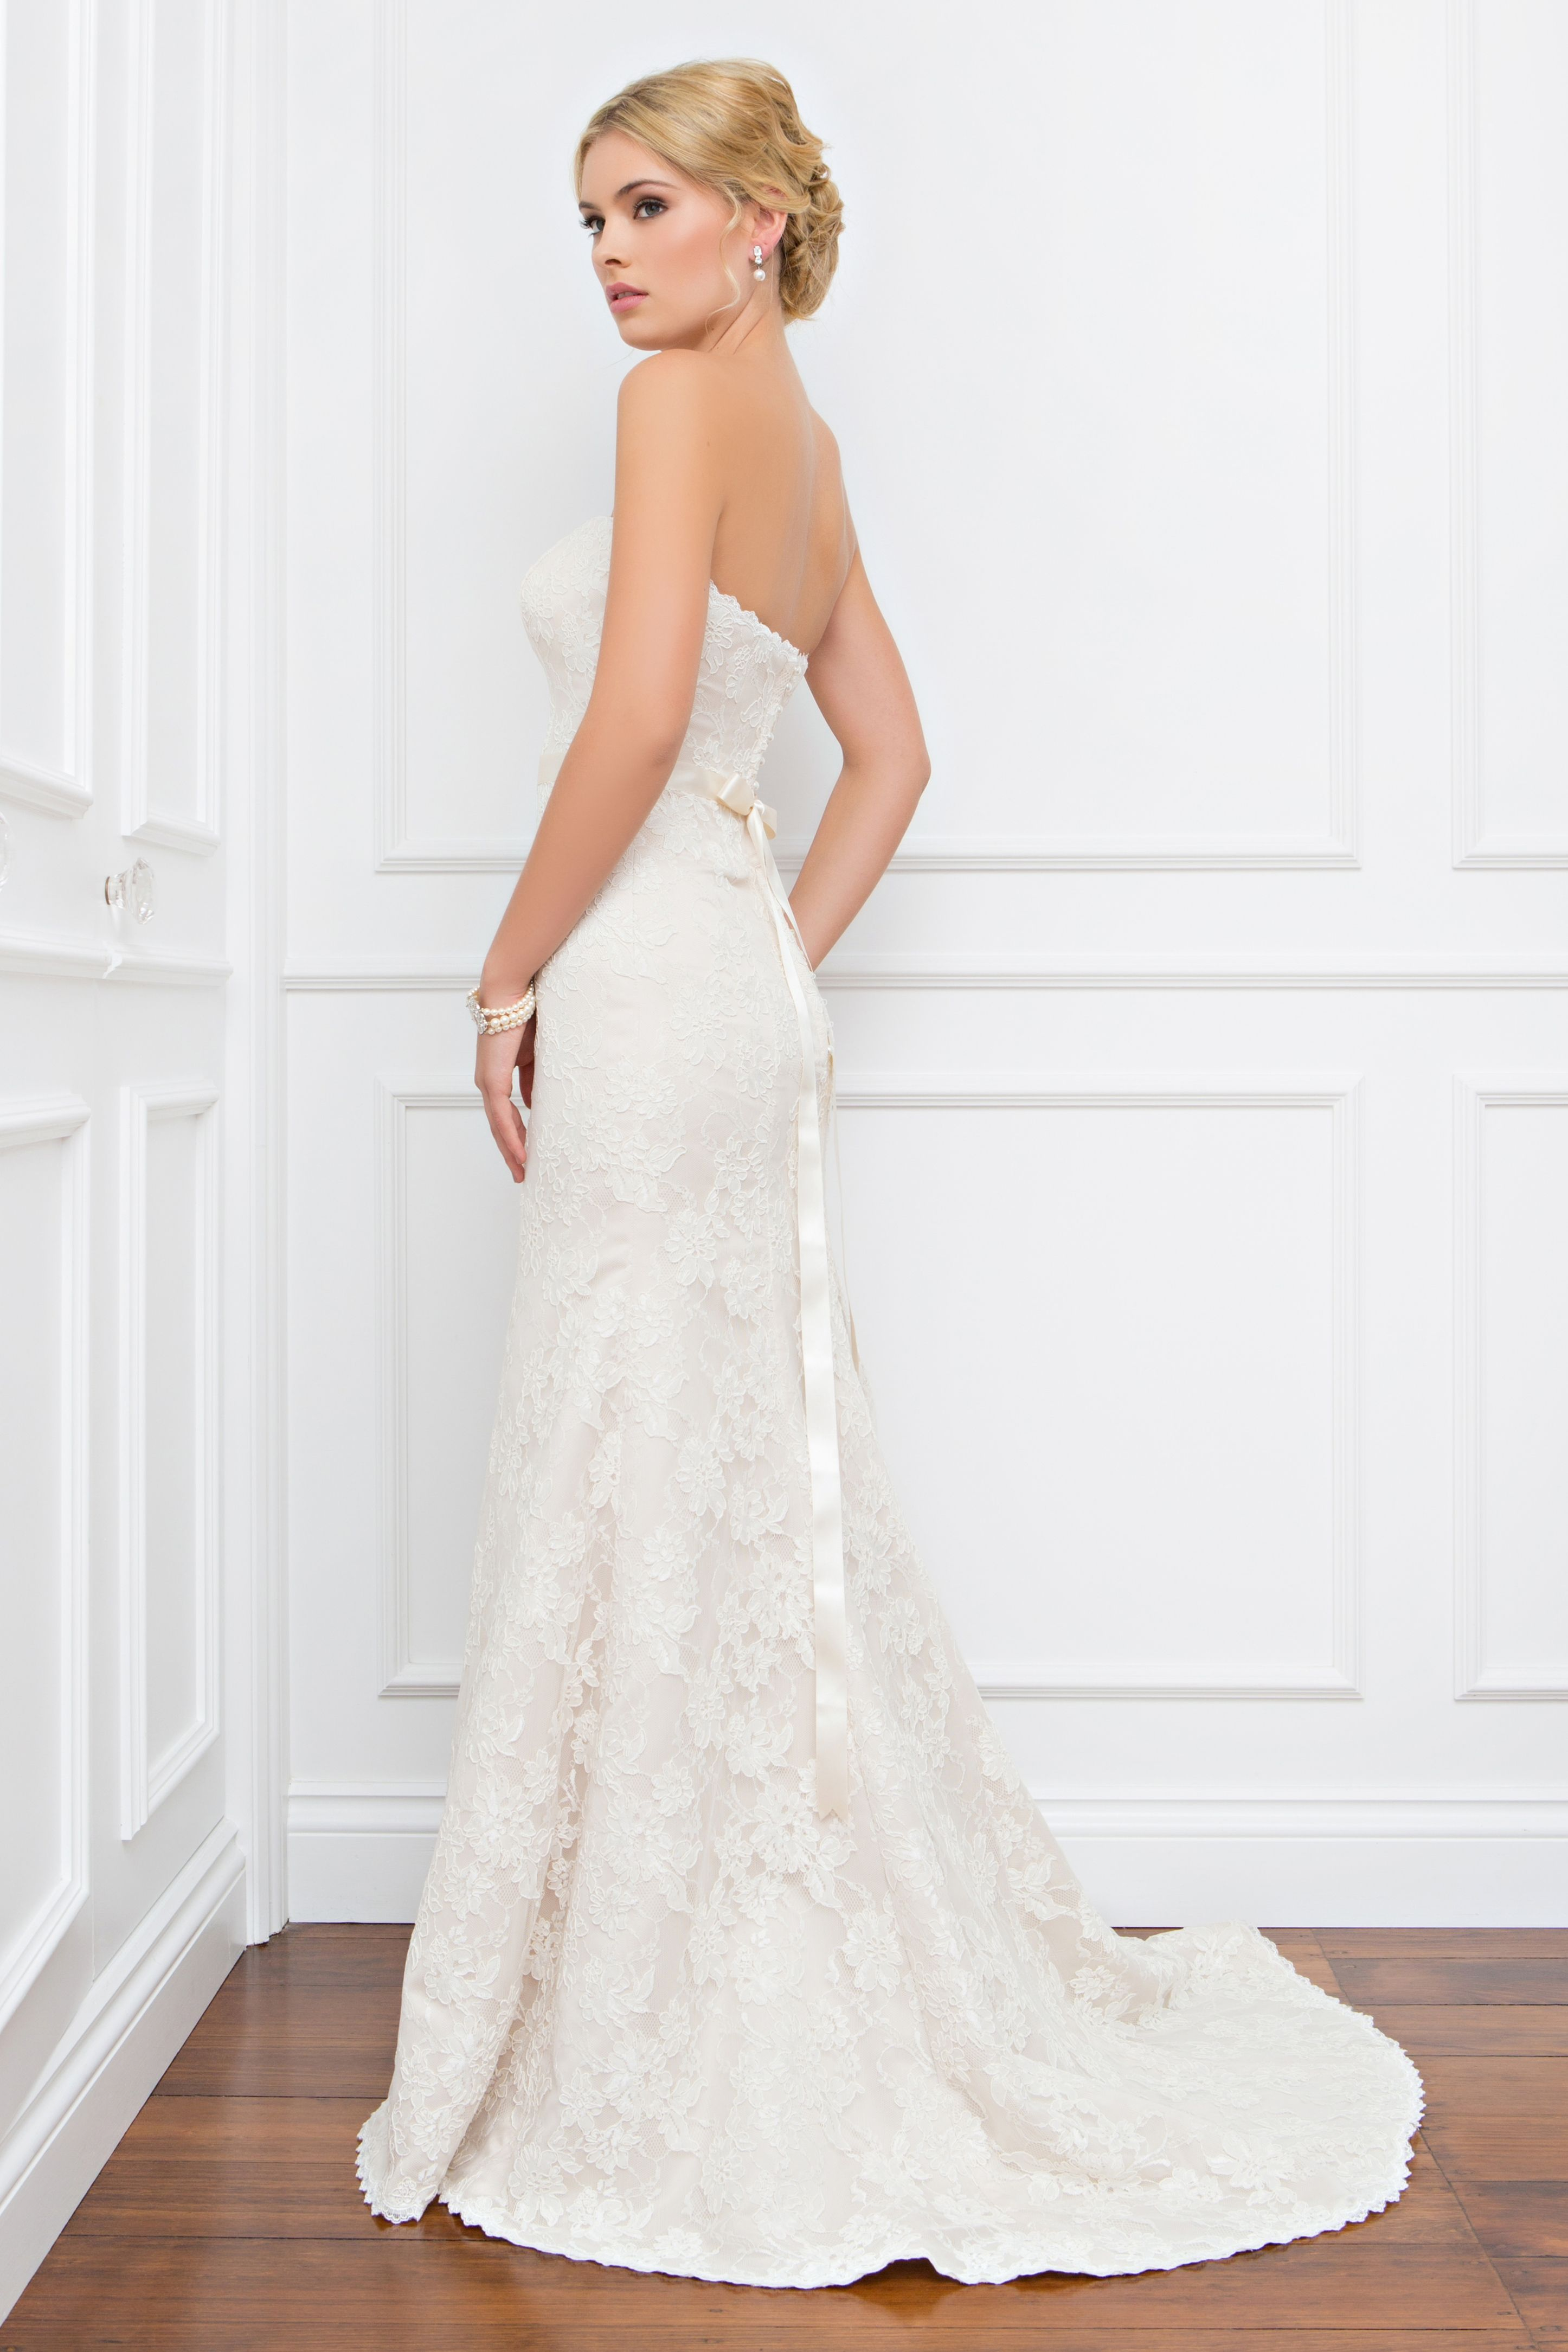 Ellie // Wendy Makin Bridal Designs // Ready to Wear